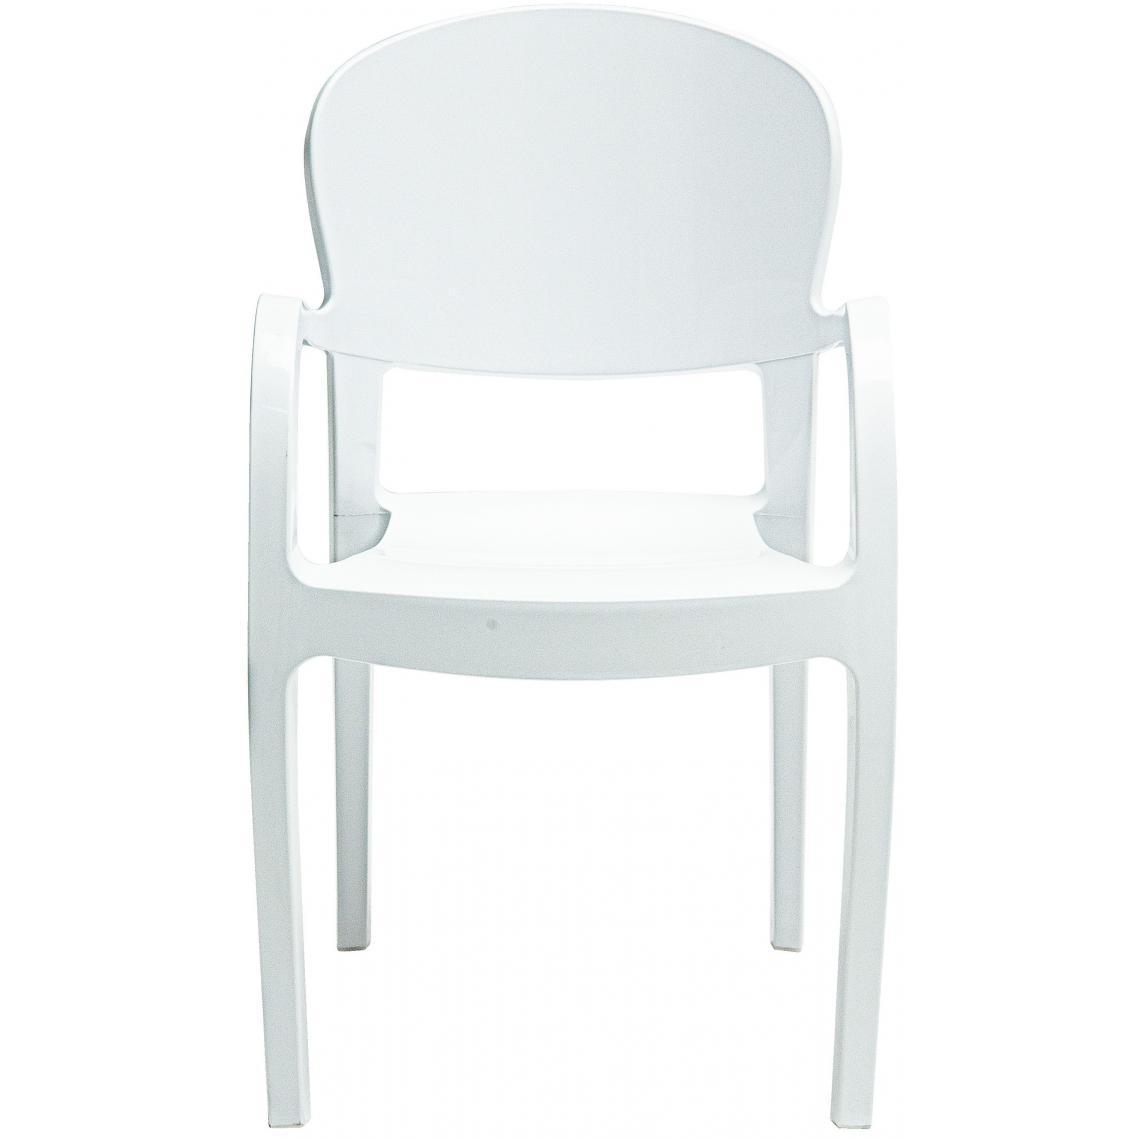 Chaise Design Blanche Avec Accoudoirs GLAM | 3 SUISSES